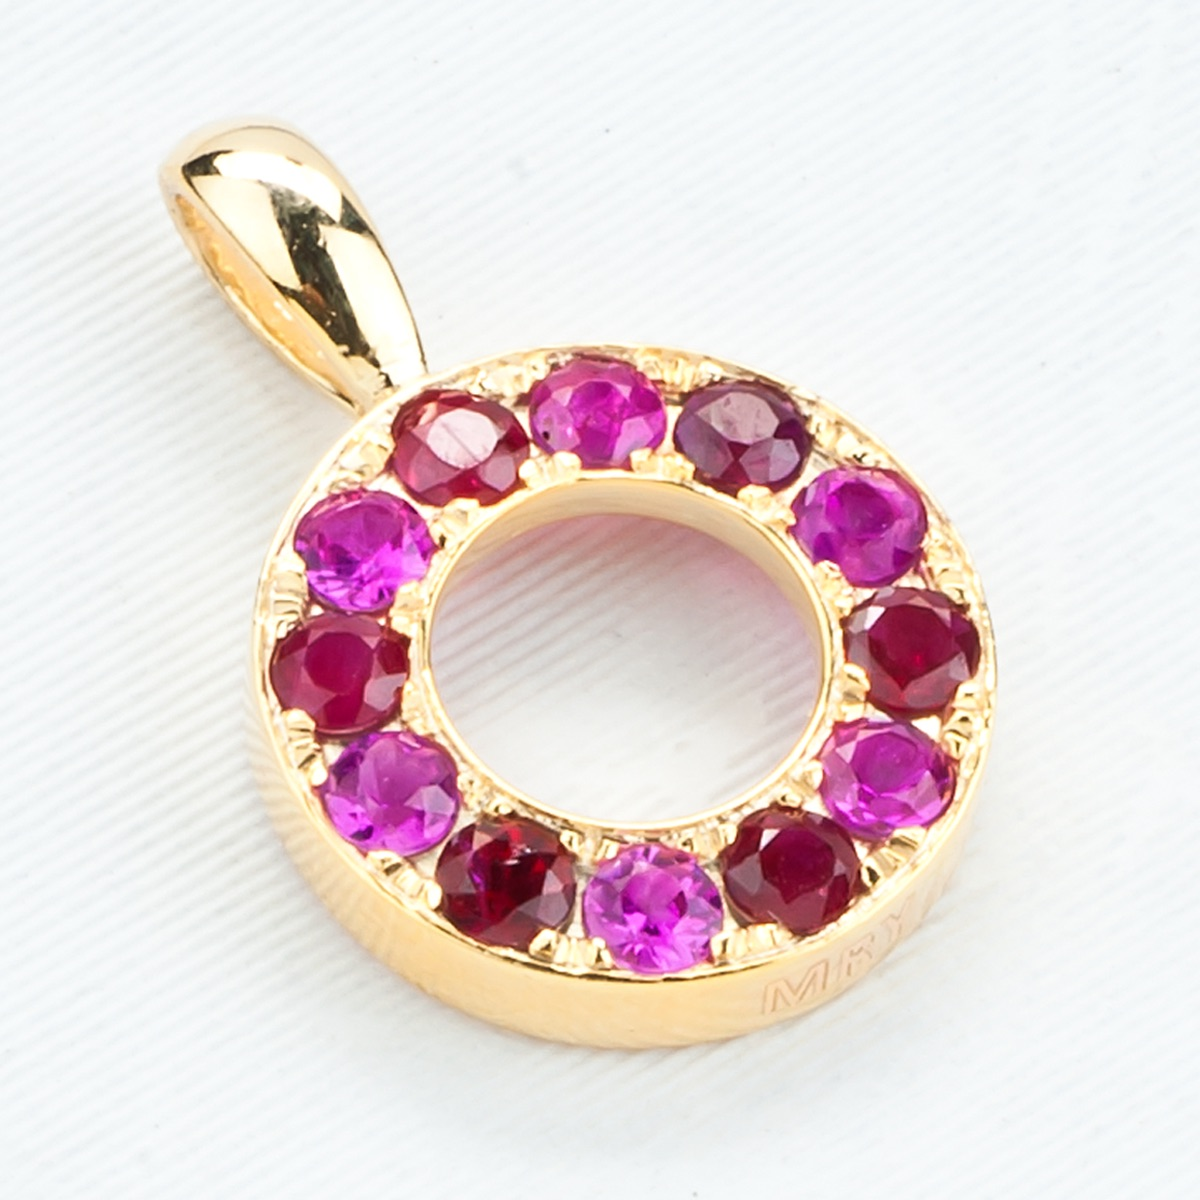 miaruby-myanmar-jewellery-gold-ruby-sapphire-halo-pendant-EPHH0103.jpeg